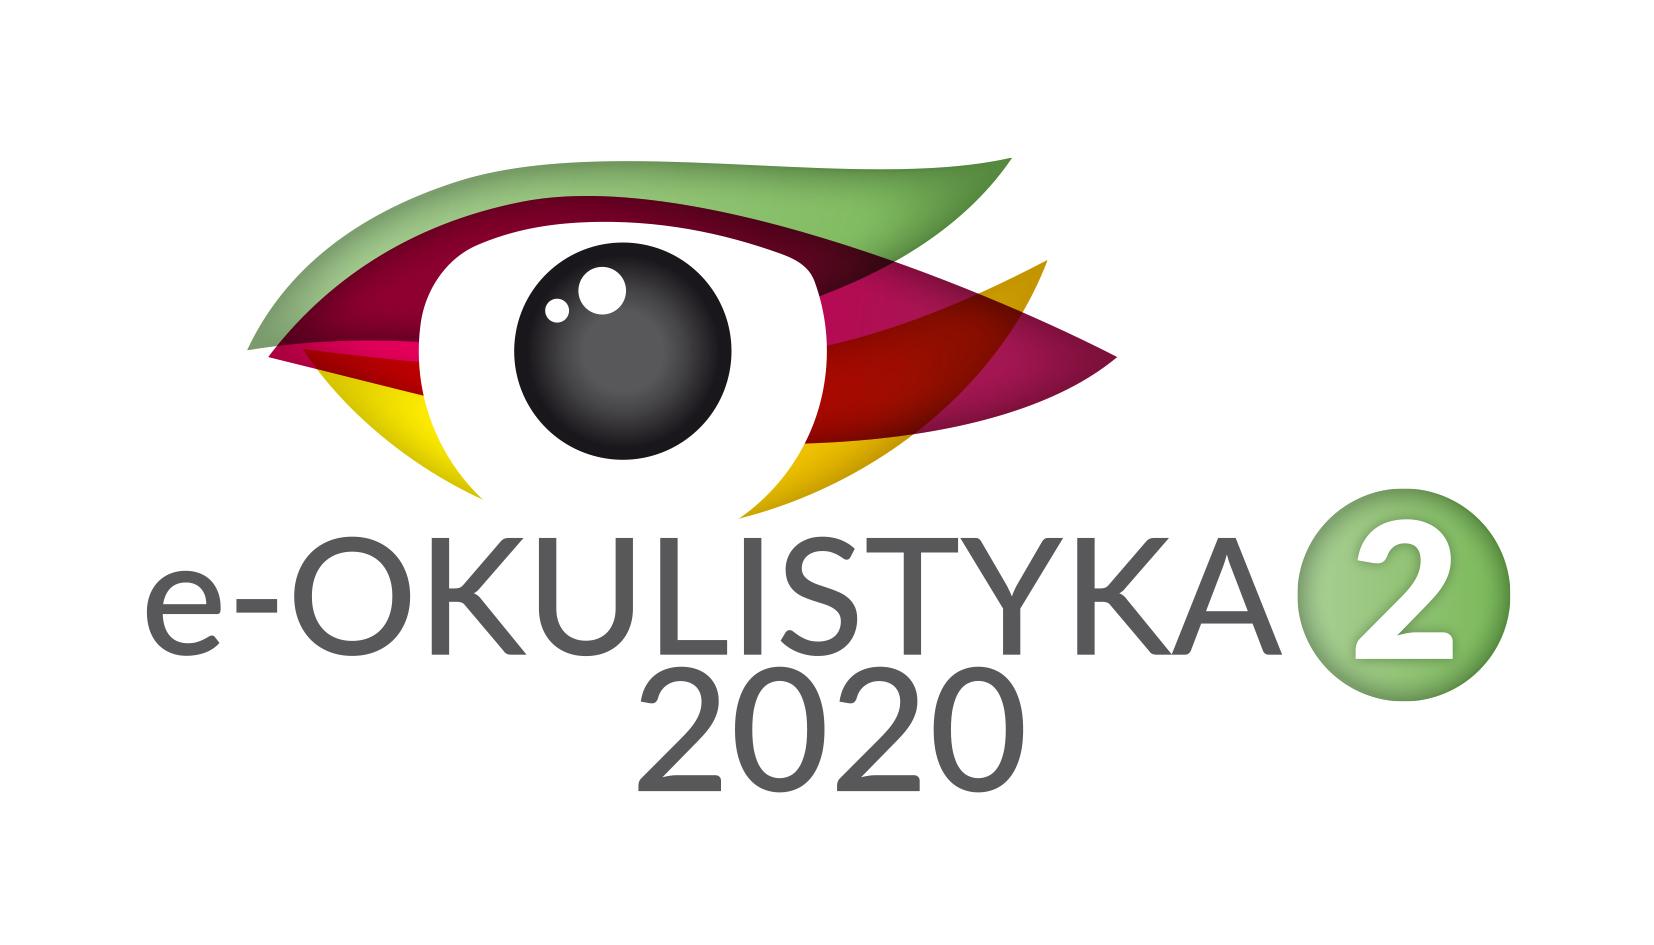 e-OKULISTYKA 2020-2 Konferencja on-line